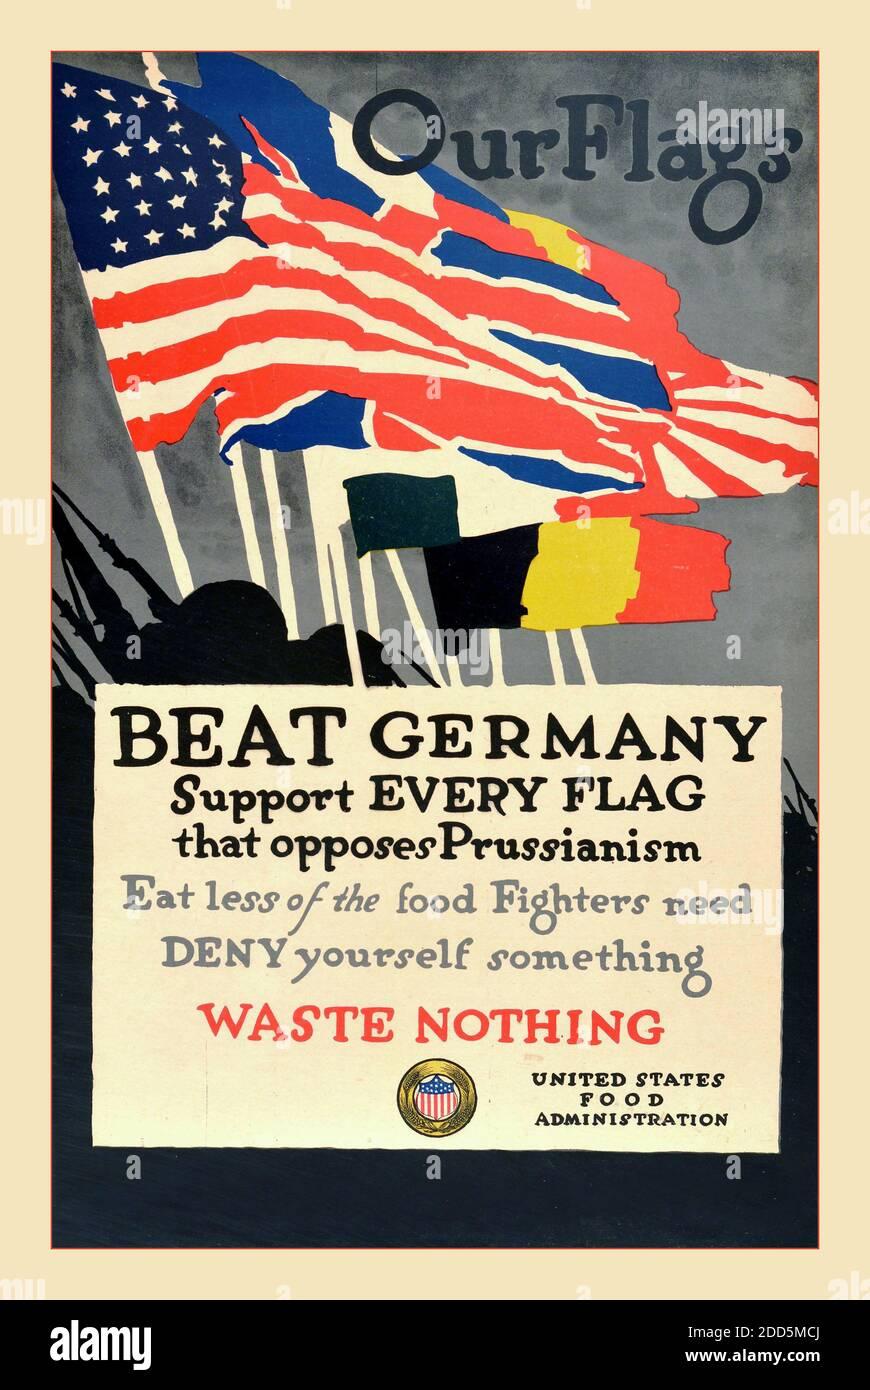 SET of 4 US Food Administration Vintage World War KITCHEN ART PRINTS circa 1917